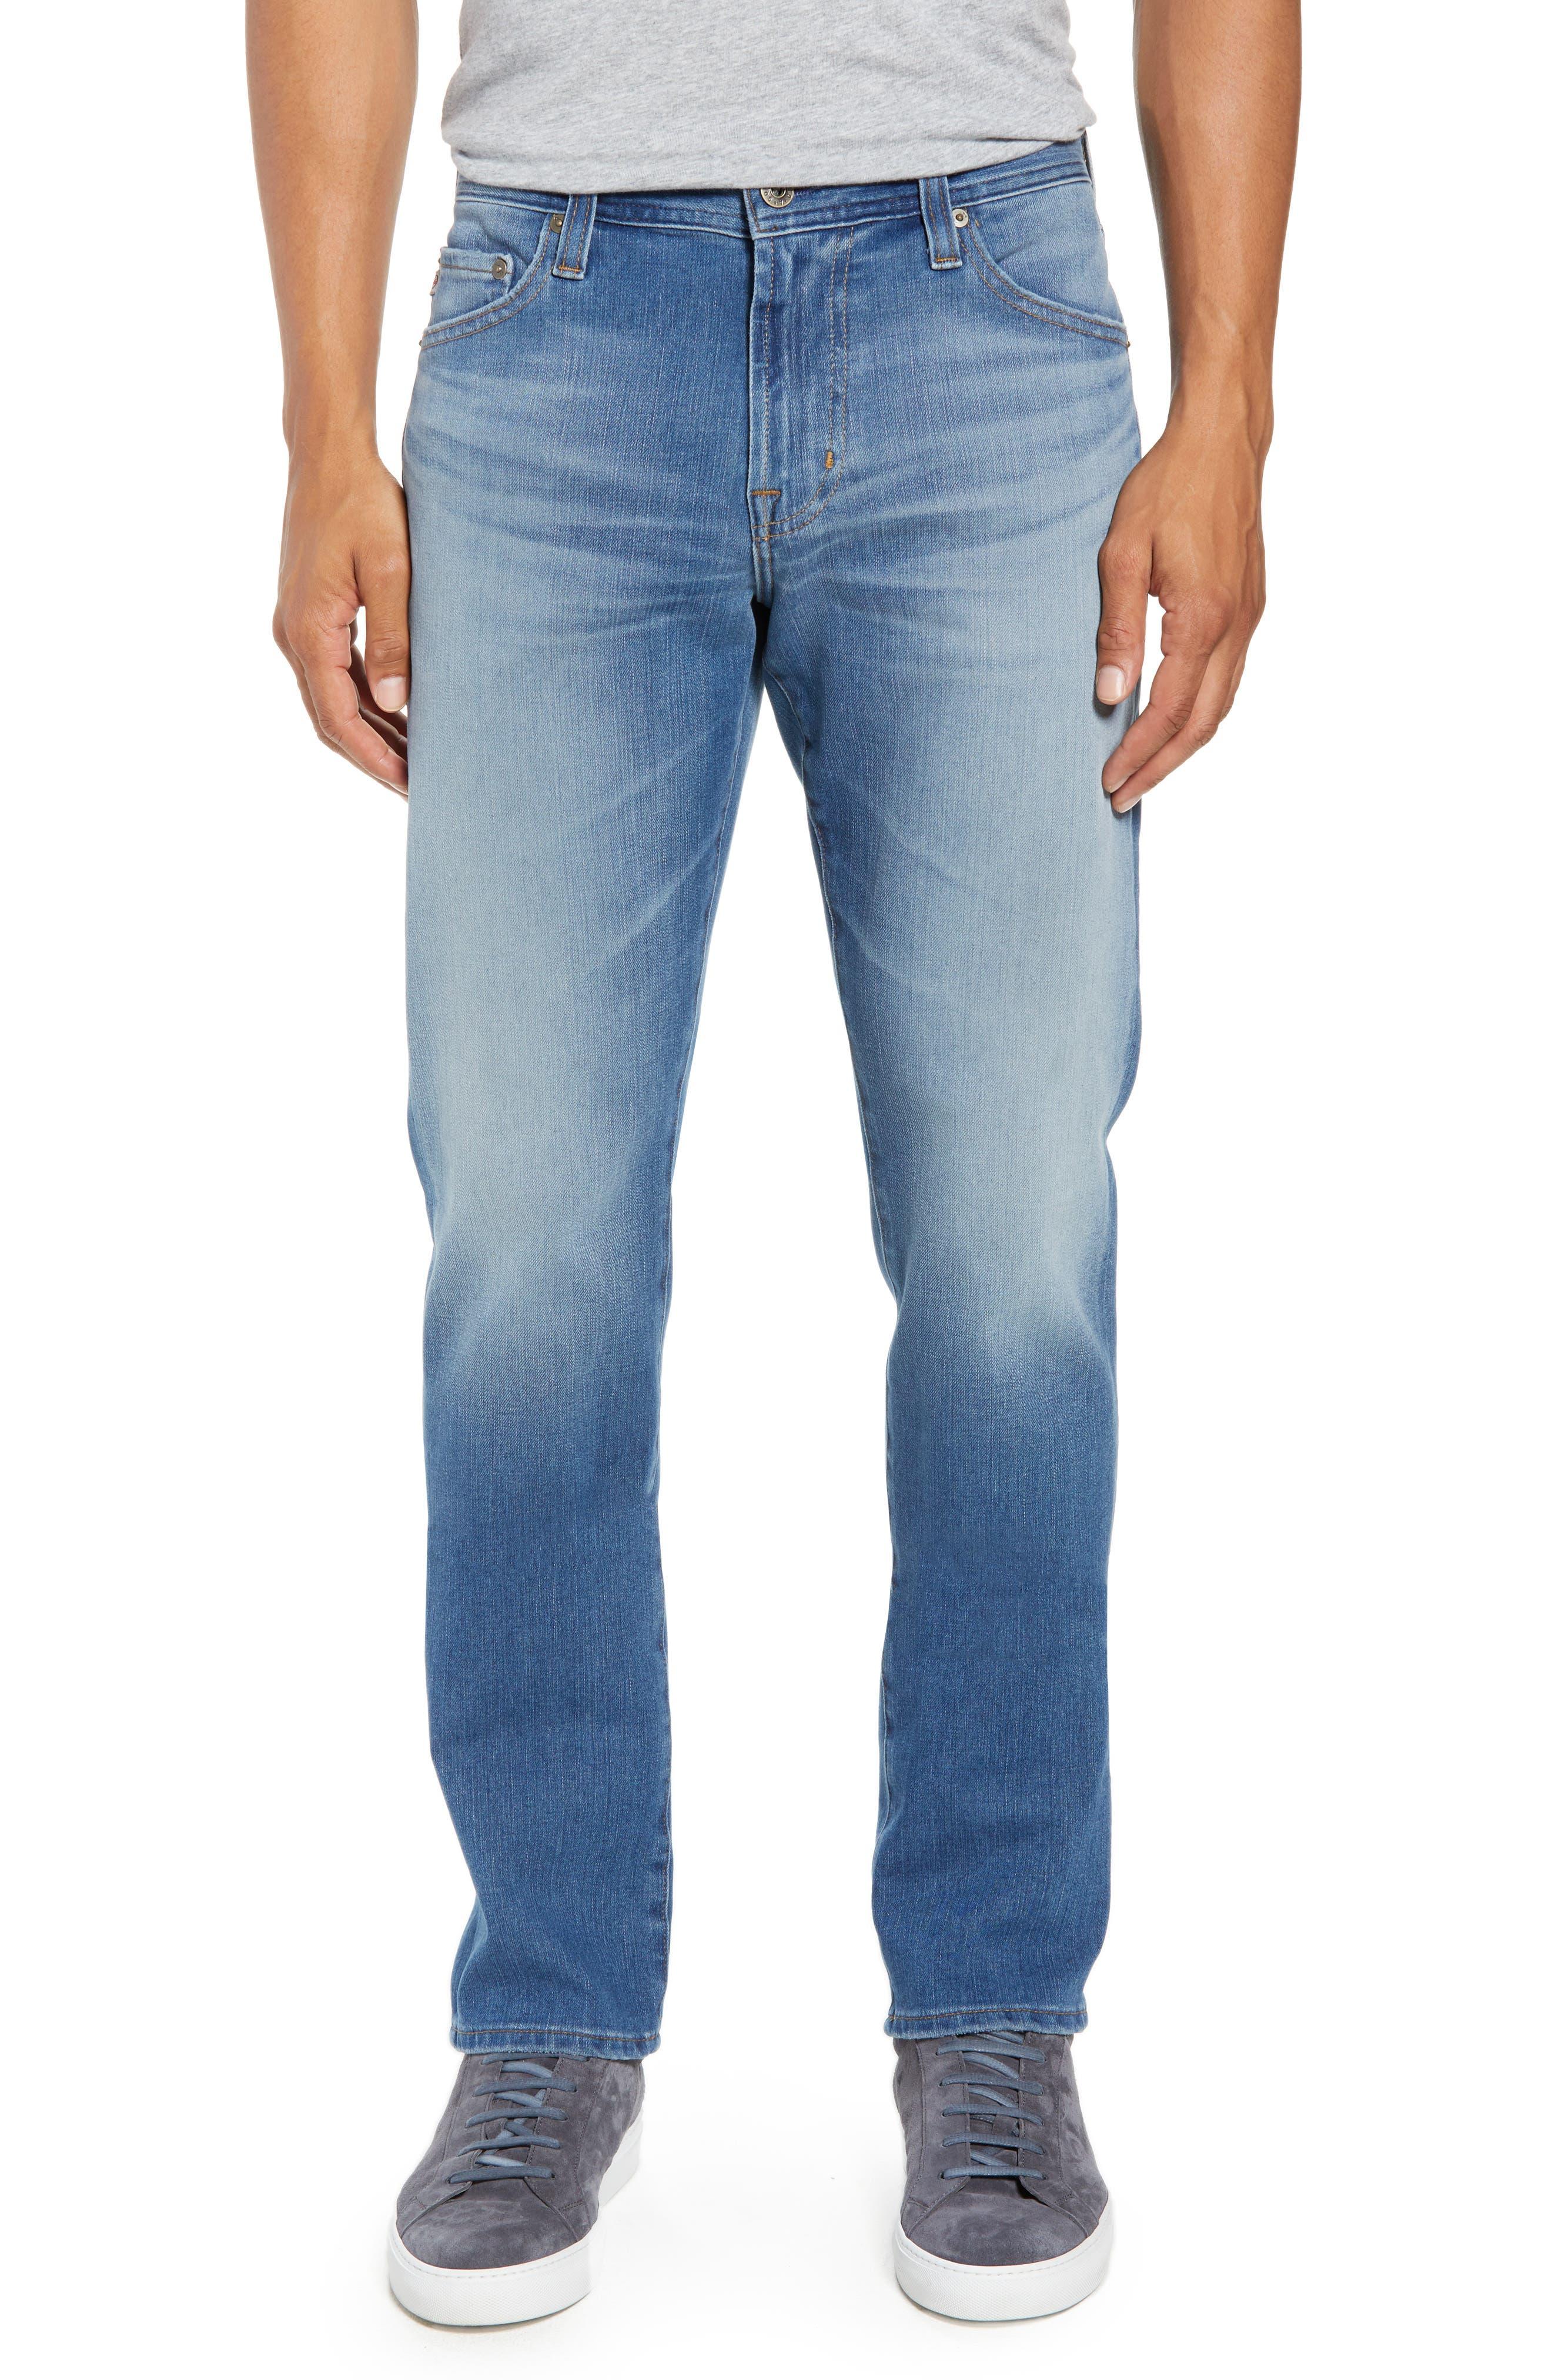 Everett Slim Straight Leg Jeans,                         Main,                         color, Merchant